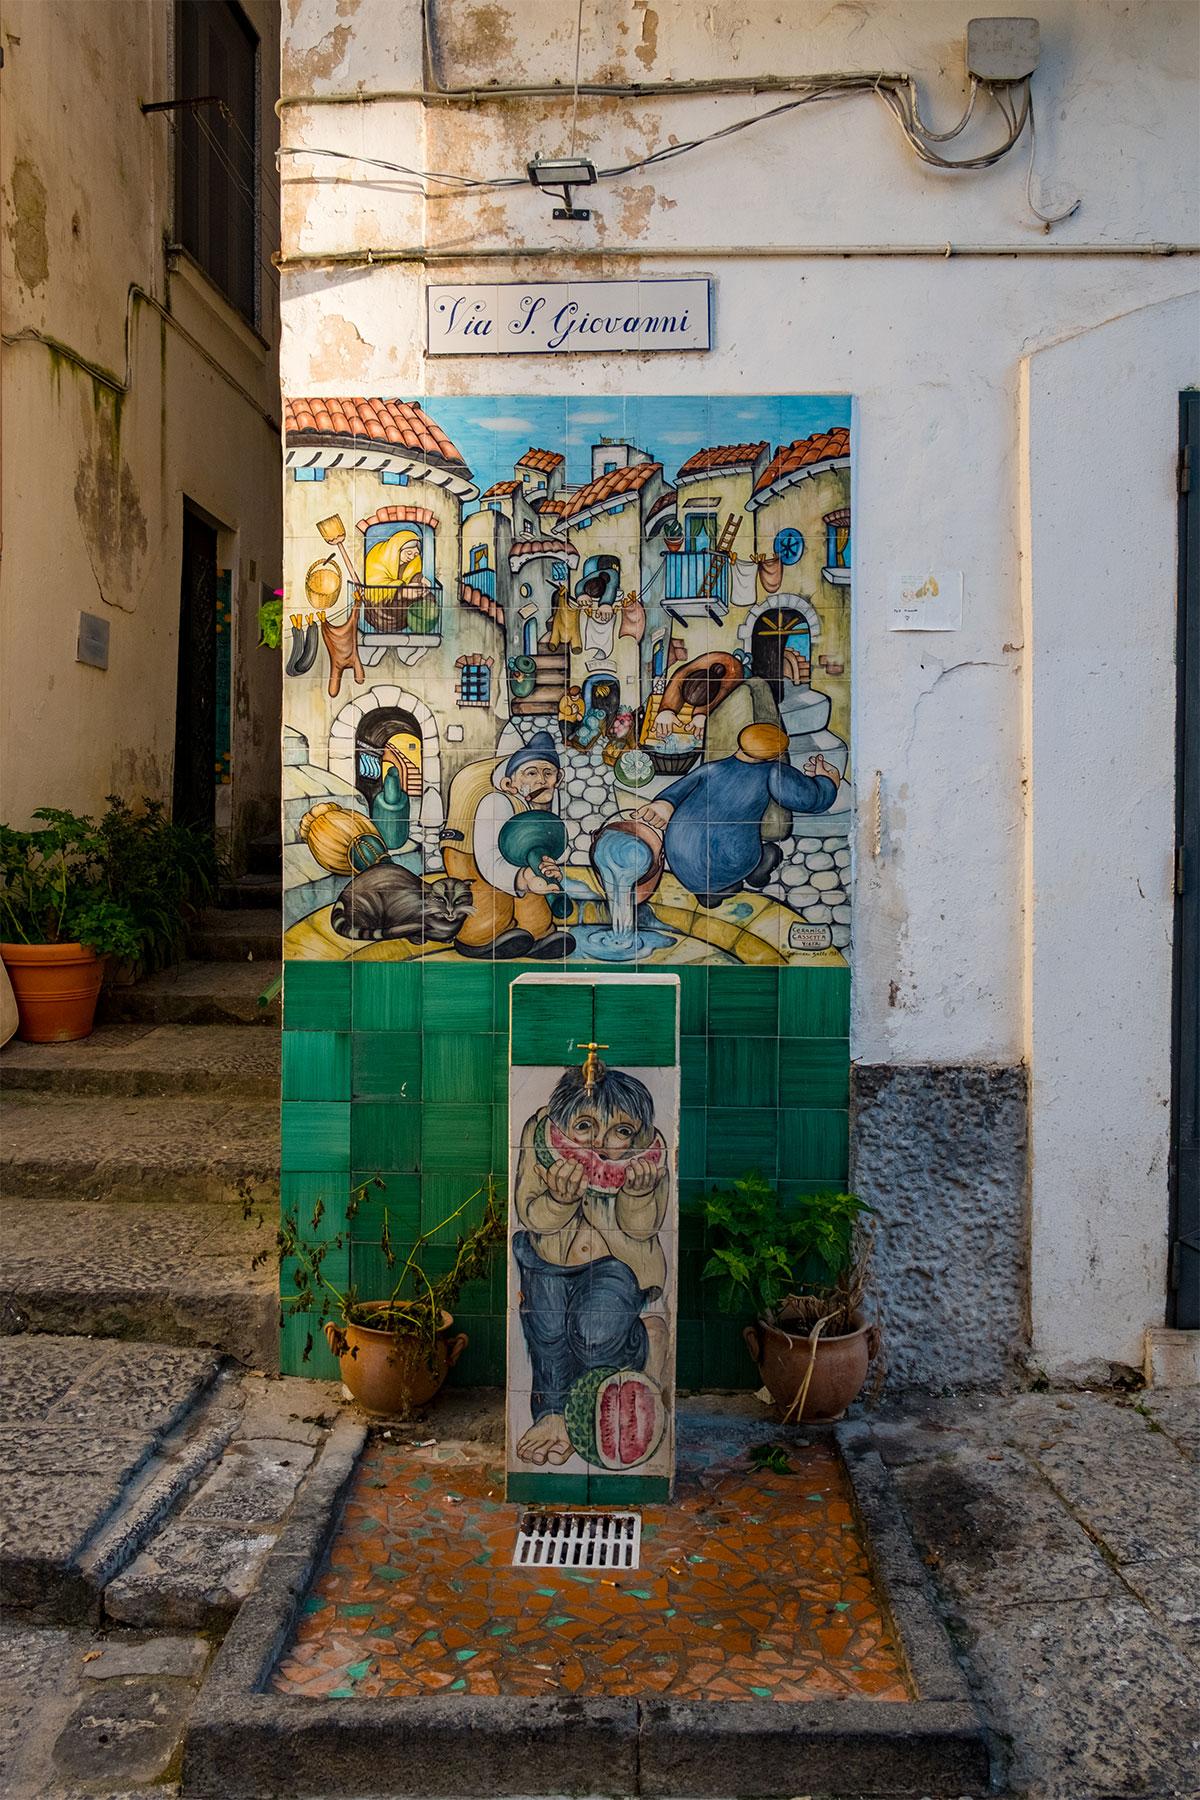 Via San Giovanni Vietri sul Mare